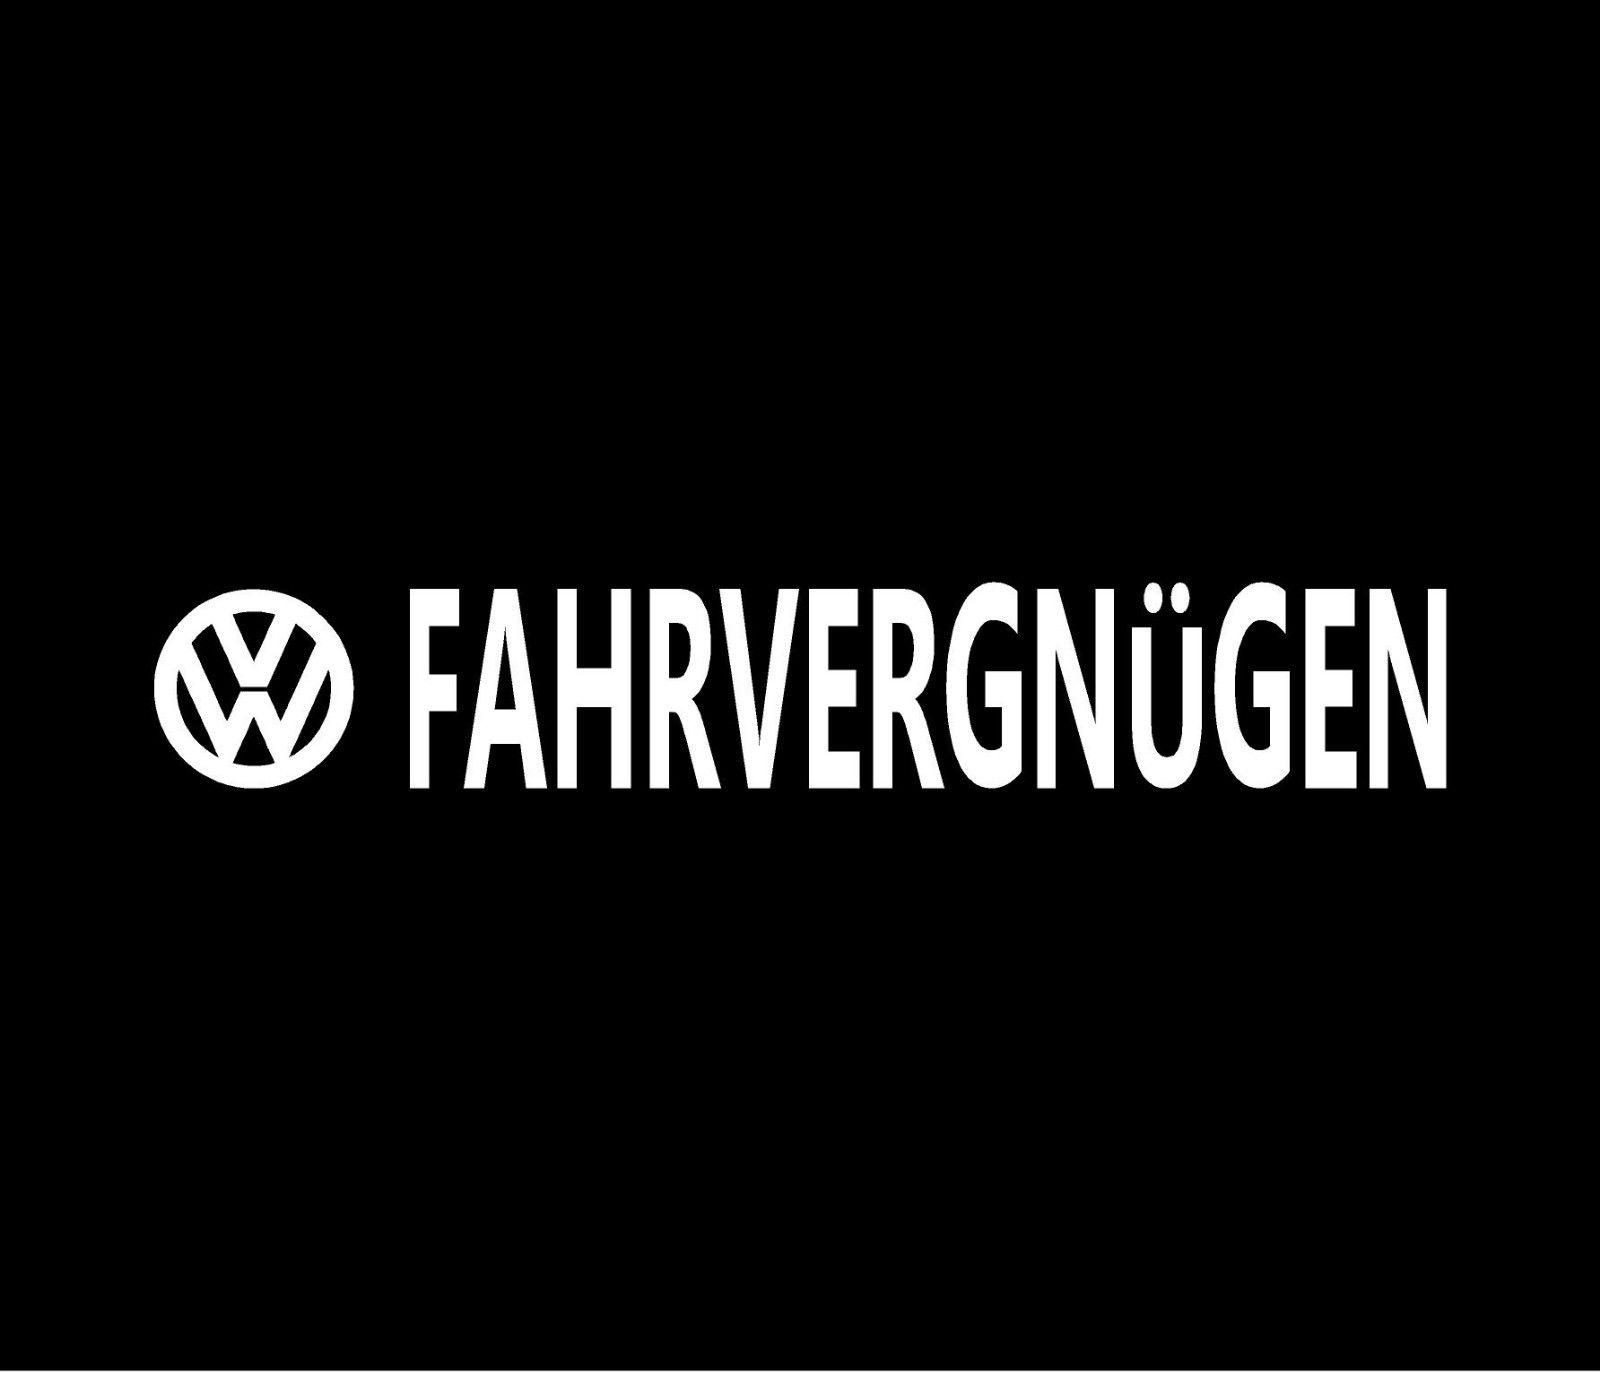 Wandtattoos Wandbilder Fahrvergnugen Vinyl Decal Car Window Bumper Sticker Volkswagen Vw Mobel Wohnen Om zelf te plakken of om te laten plakken. هنرکده سفیر صنعت